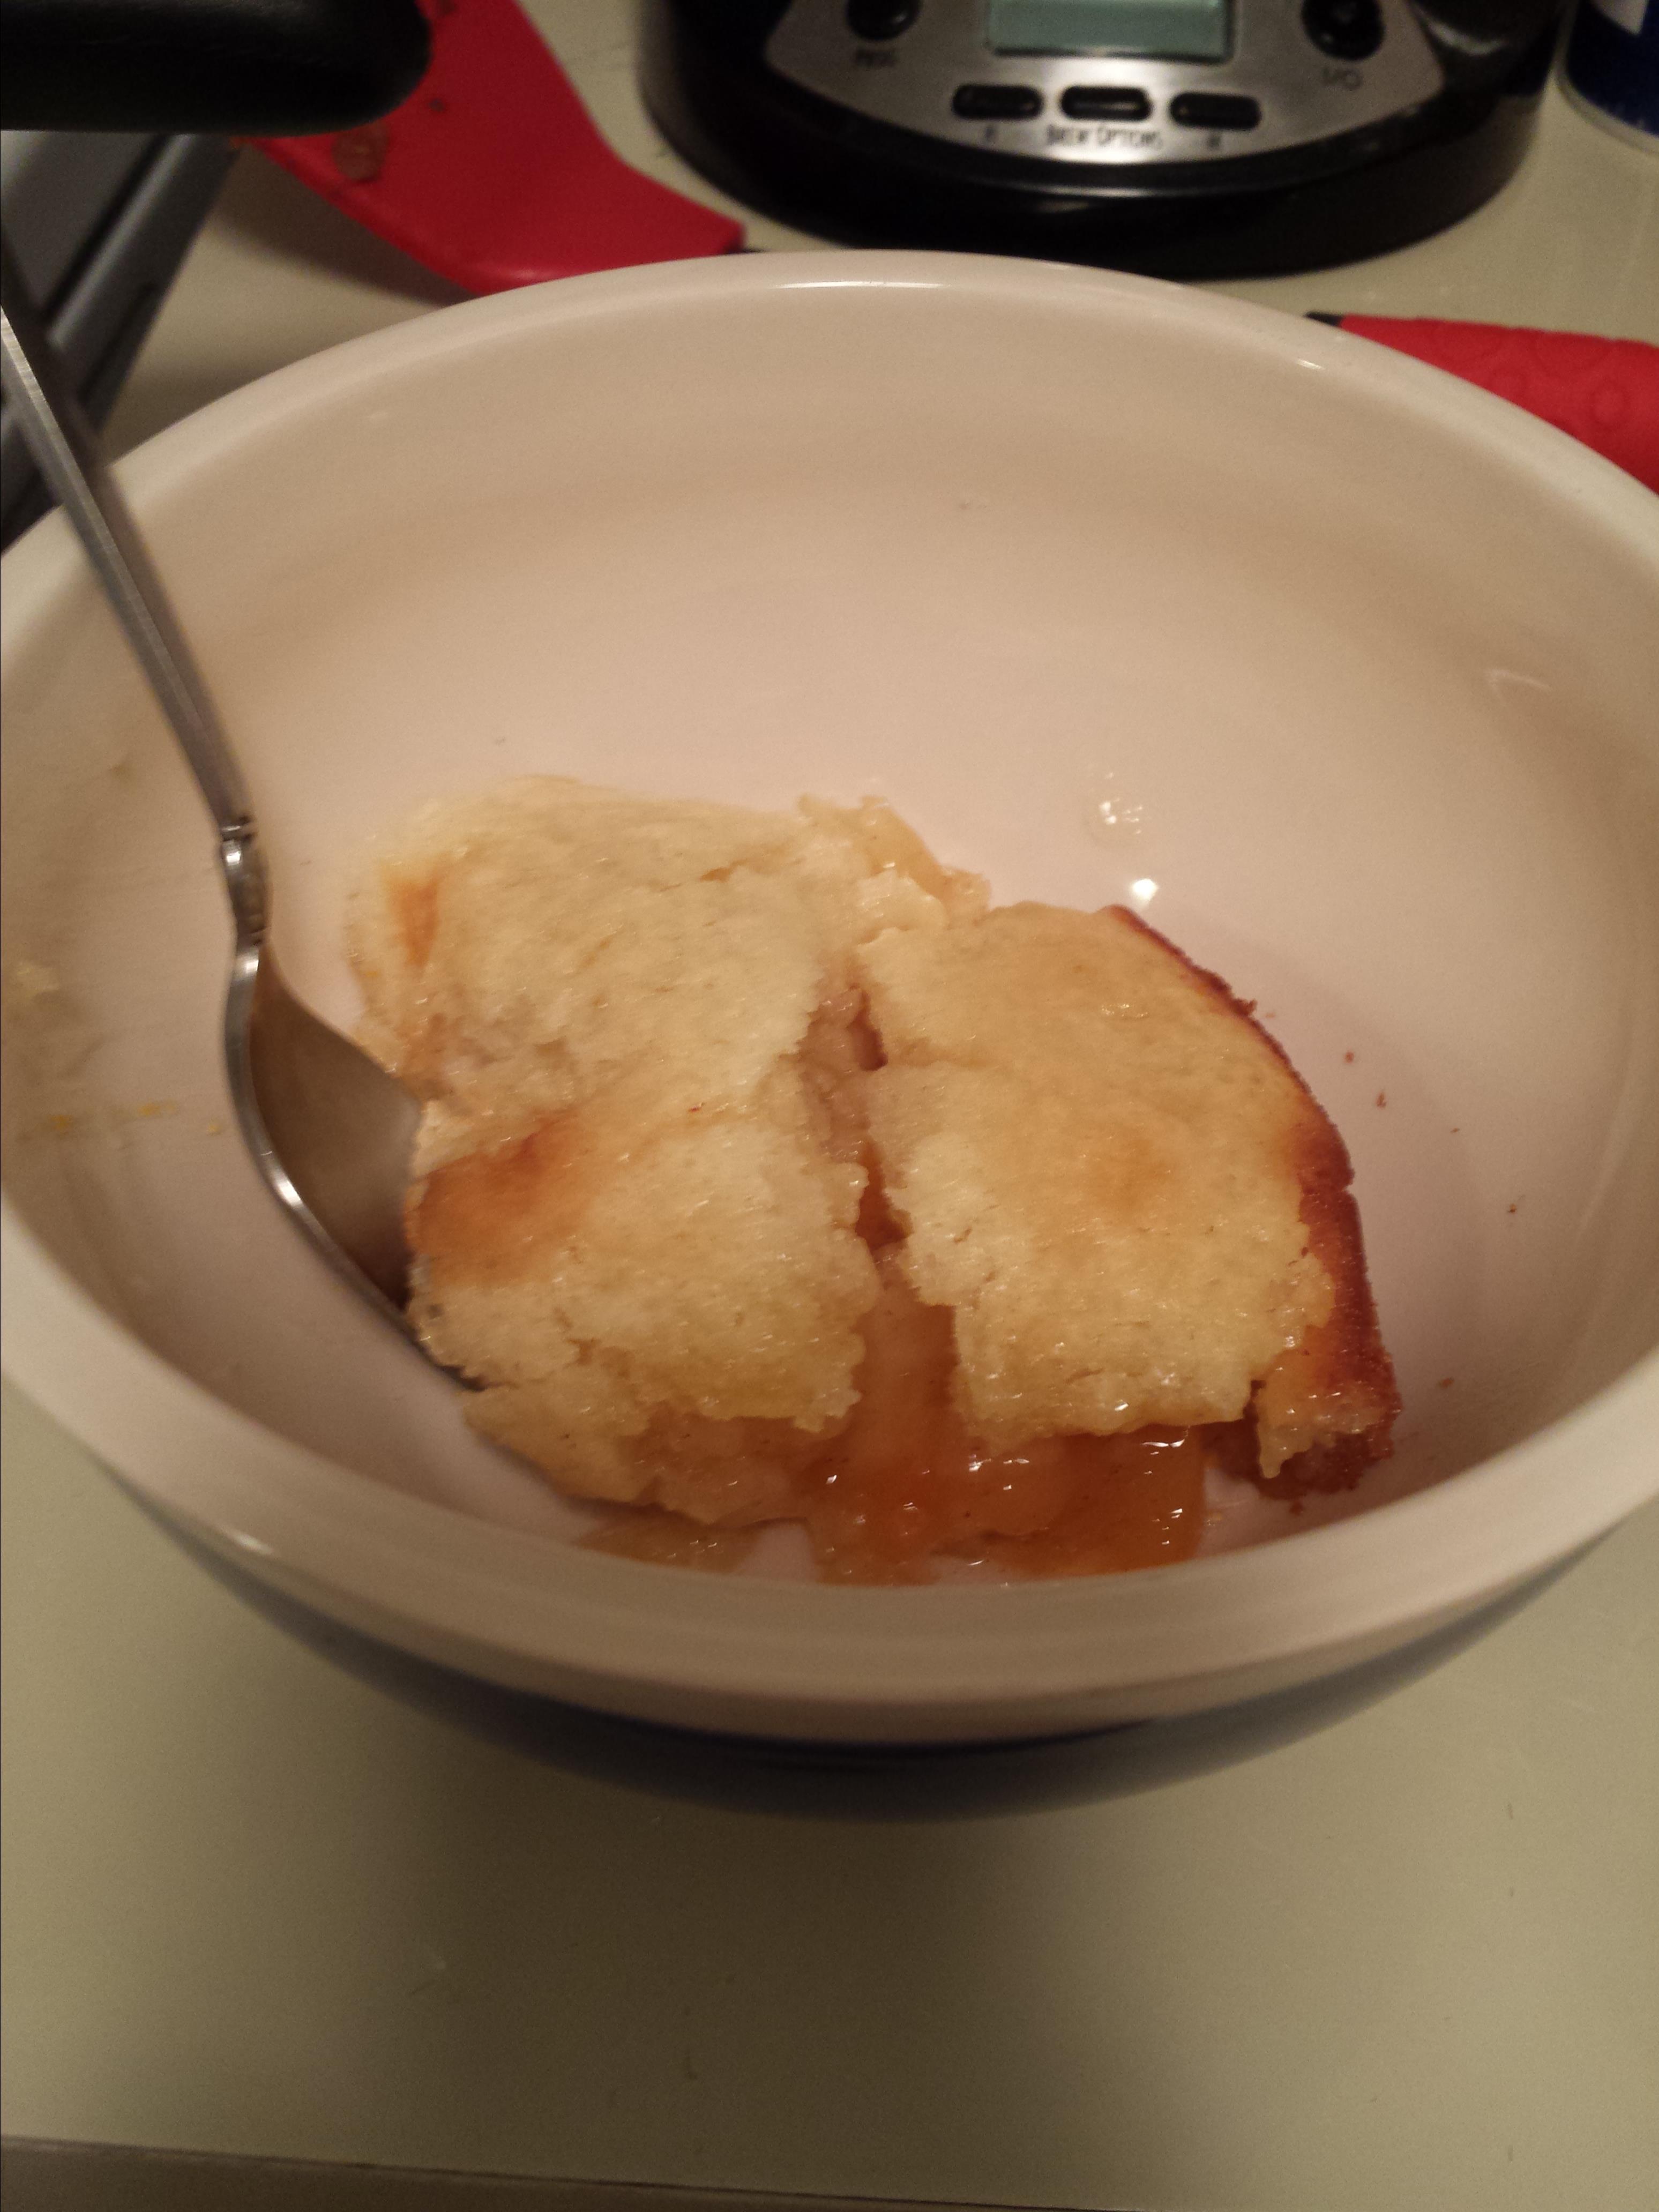 Chef John's Peach Cobbler